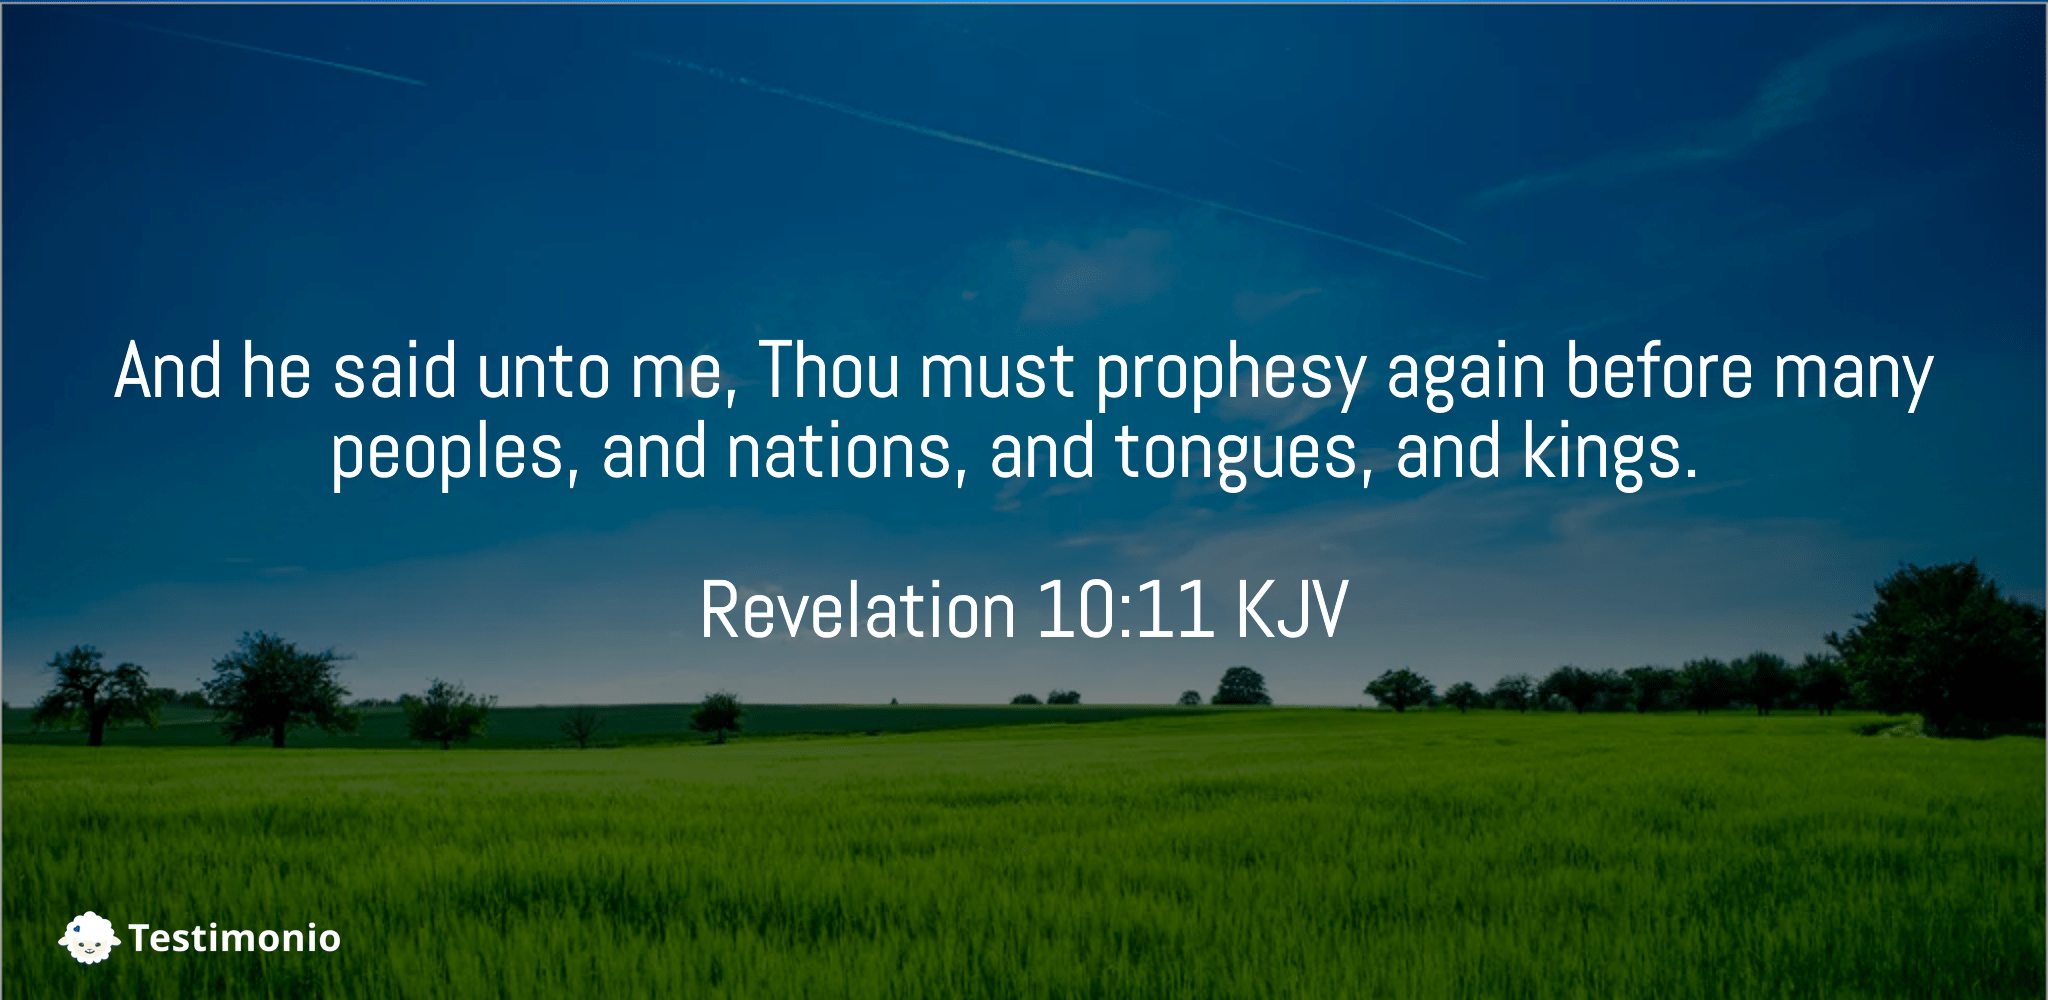 Revelation 10:11